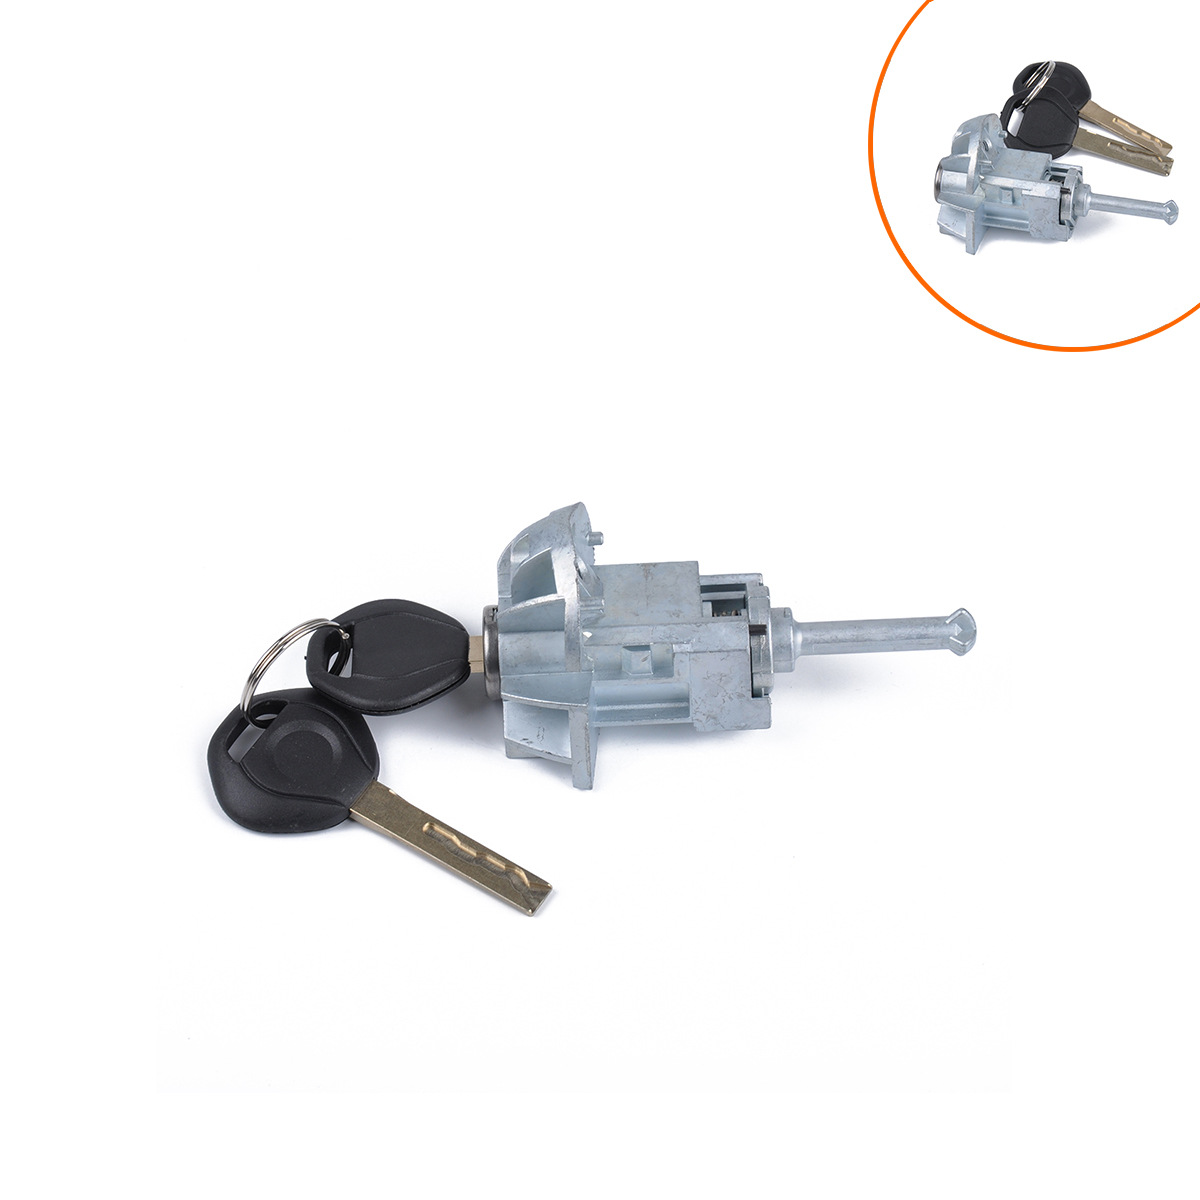 EBAY热销-适用于BWM宝马E46左门锁芯锌合金车门锁芯批发